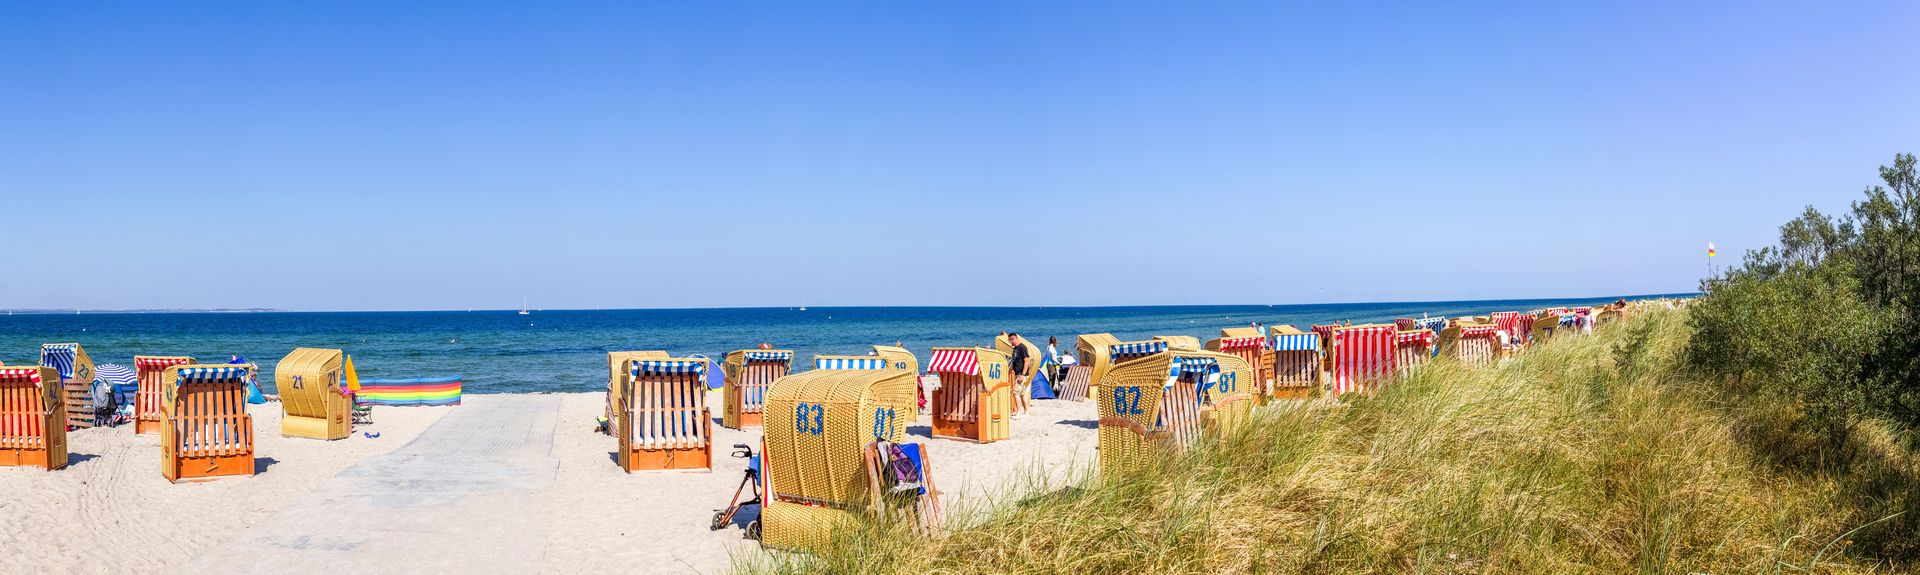 Insel Poel, Mecklenburg-West Pomerania, Germany